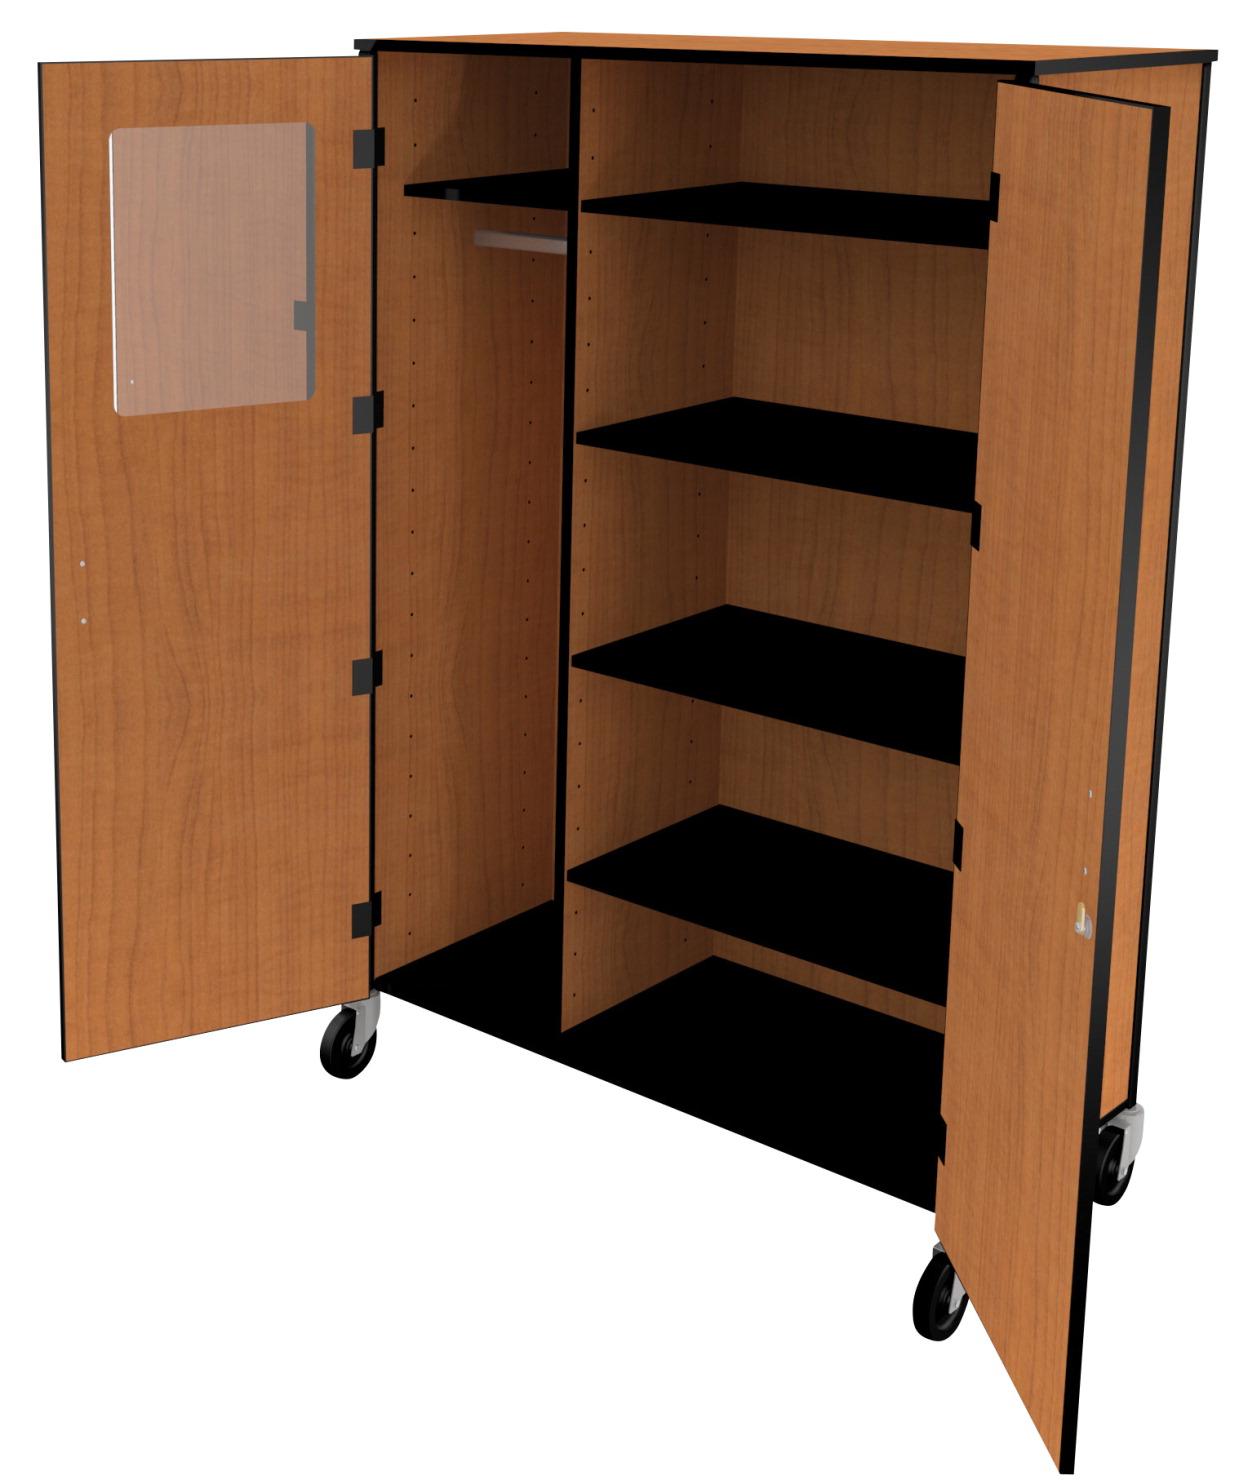 Wardrobe And Storage Cabinet School Specialty Marketplace